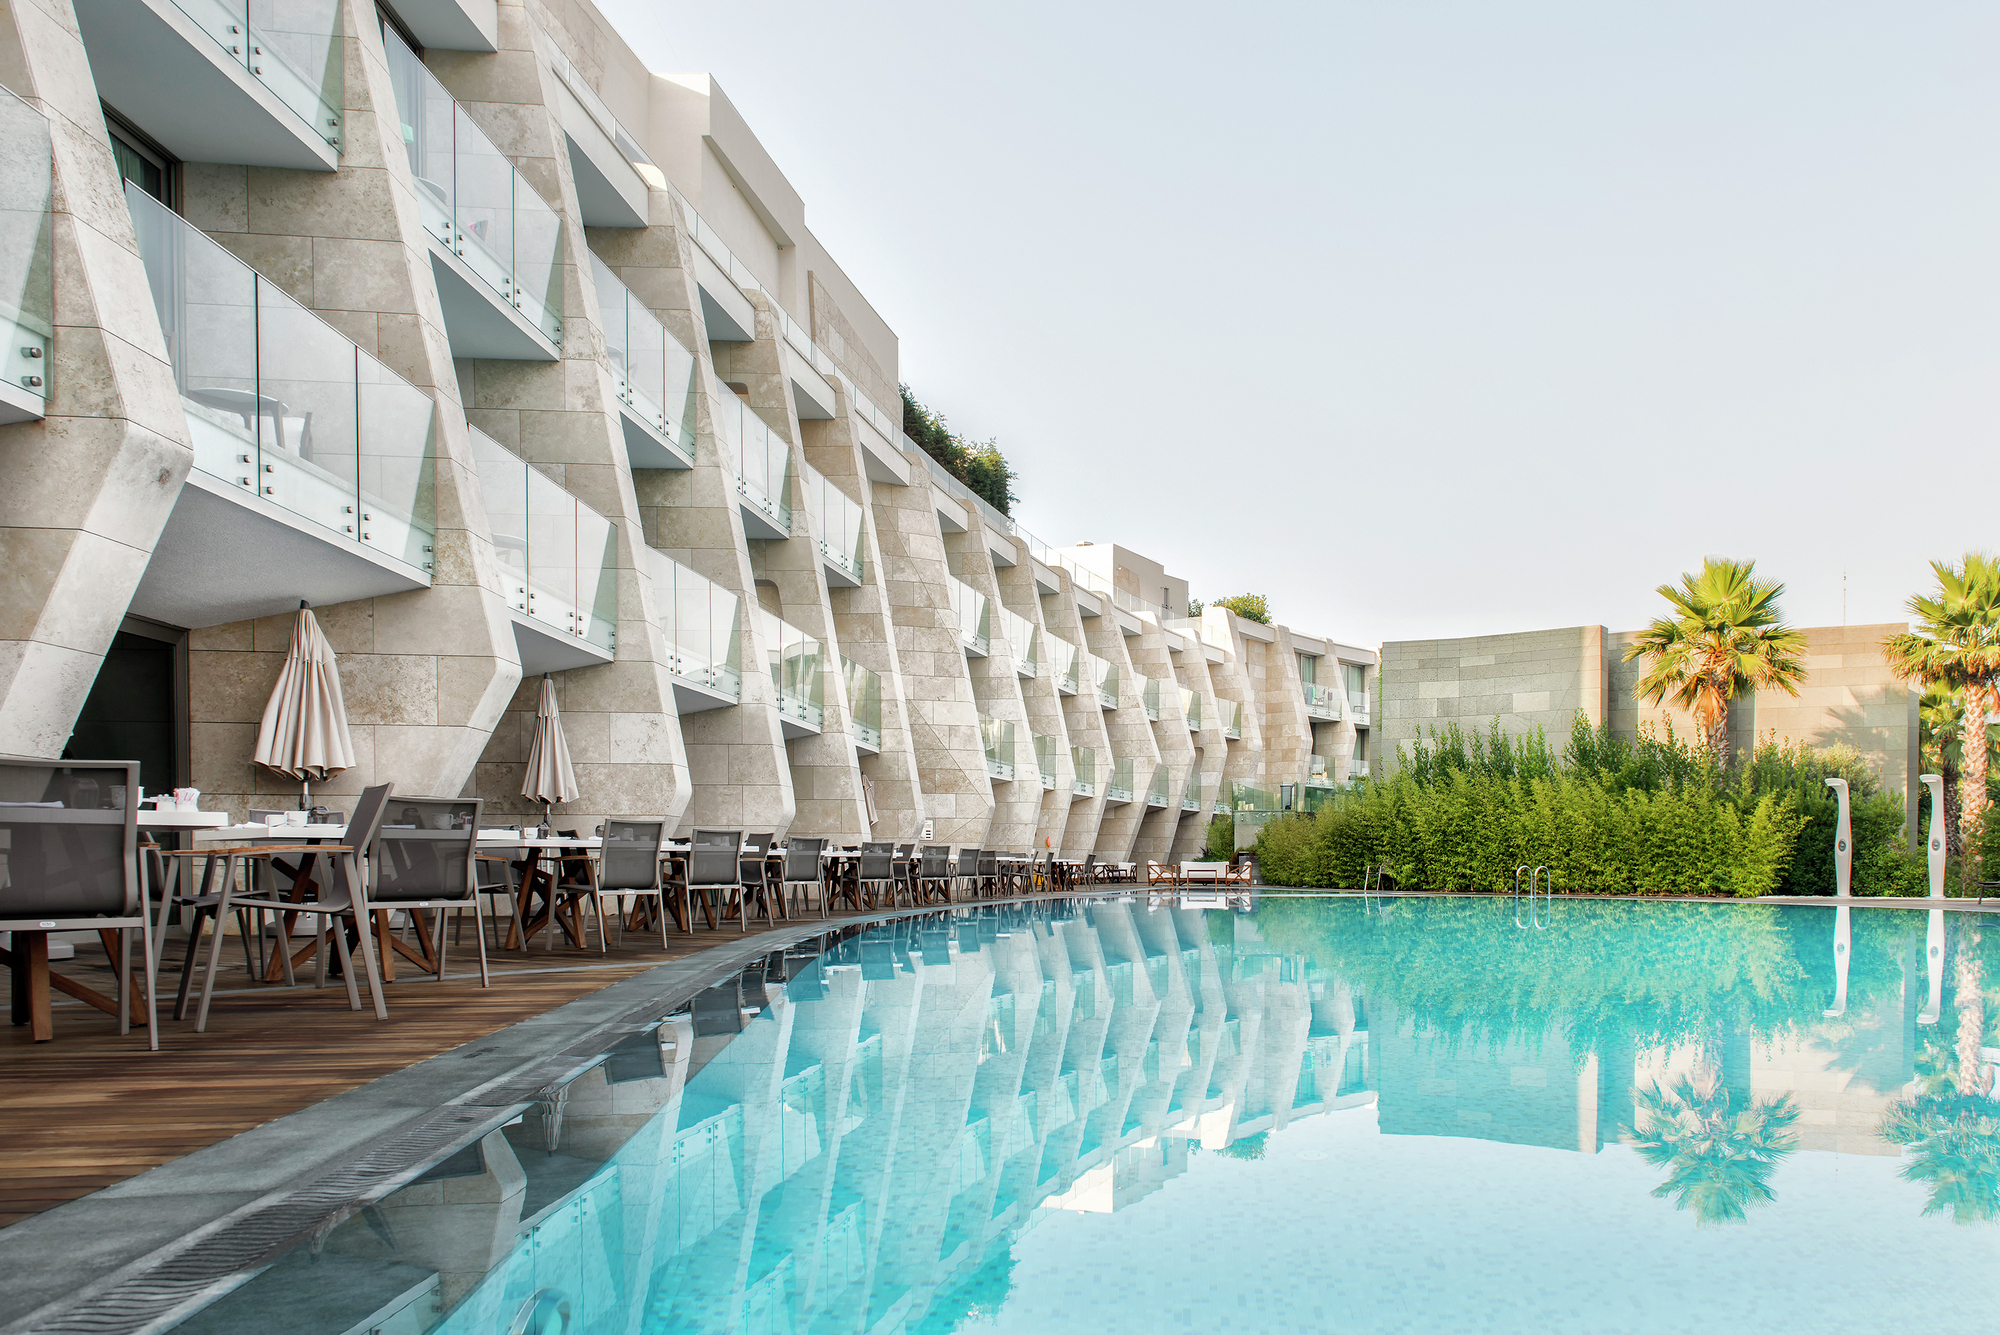 Swissotel Resort Bodrum Beach Gad & Gokhan Avcioglu